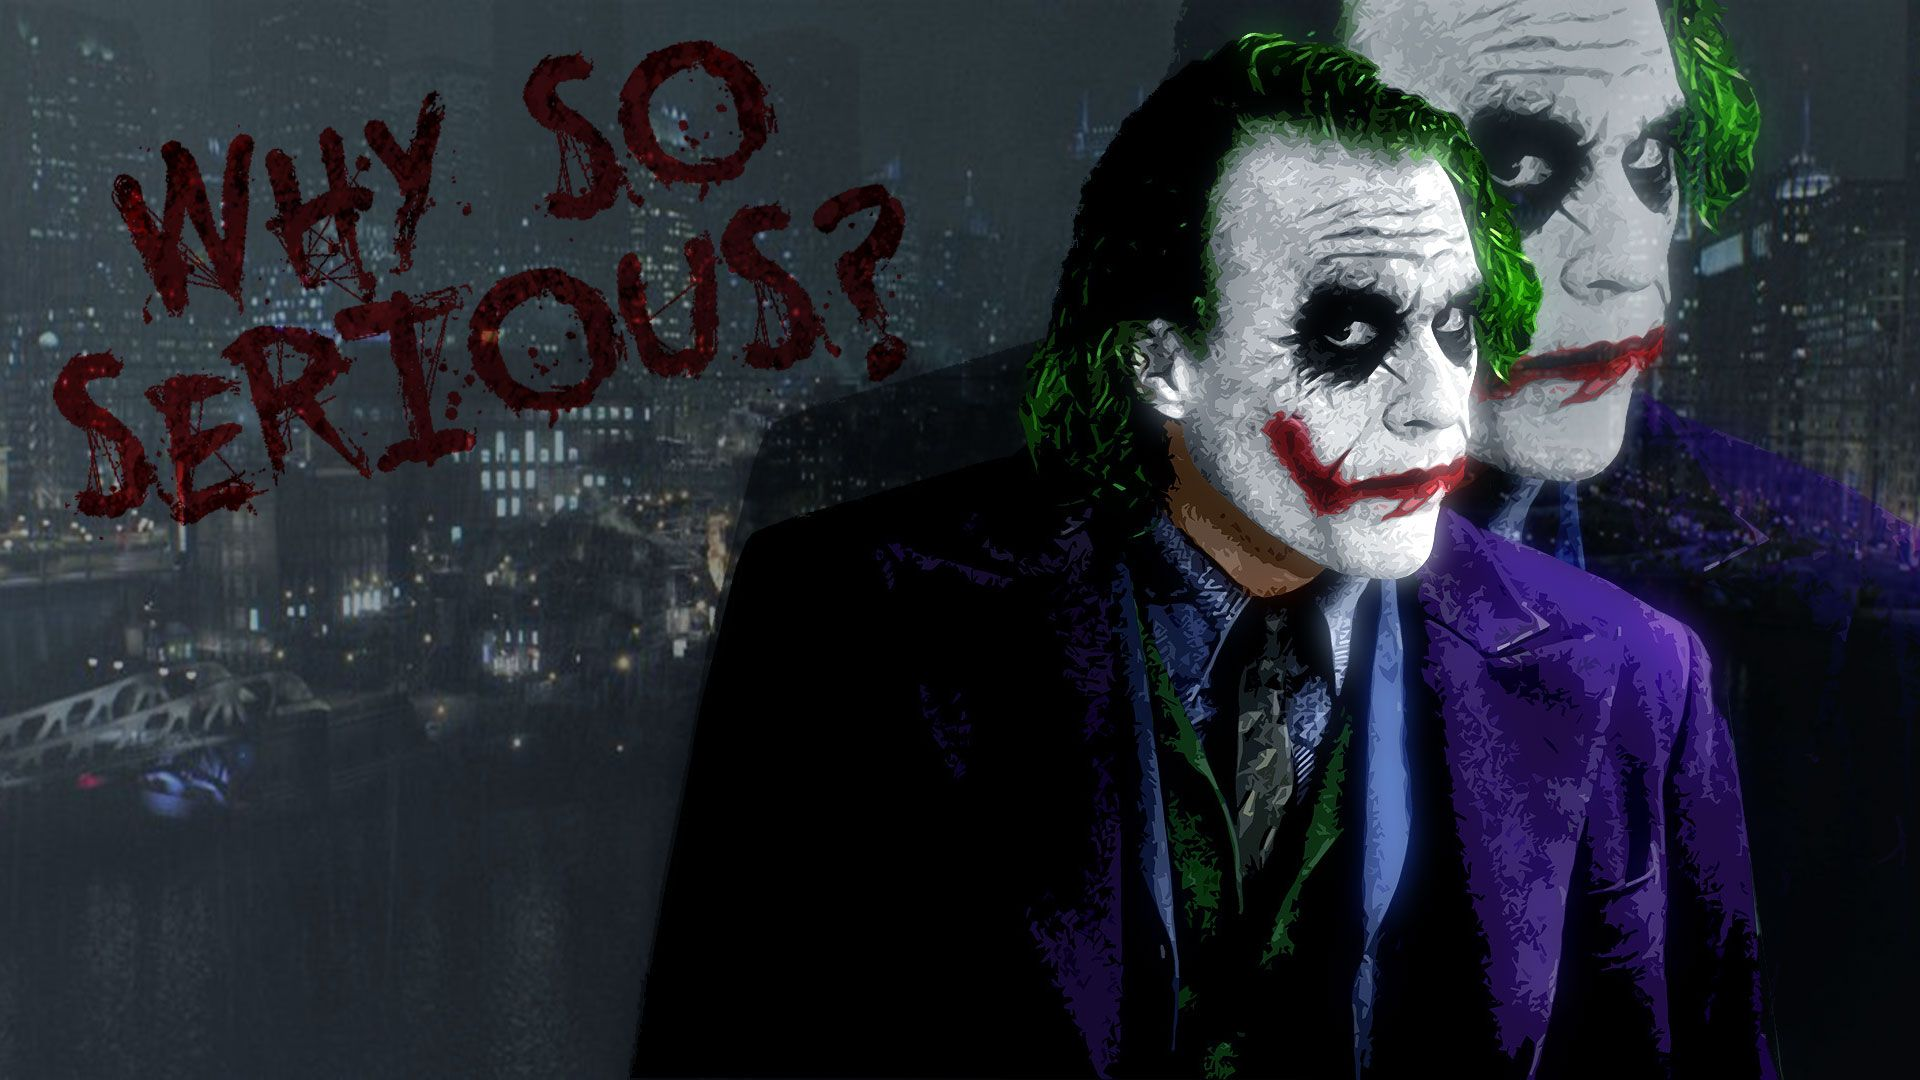 Star Wars 9 The Movie Hd Quality Batman Movie Joker Wallpaper